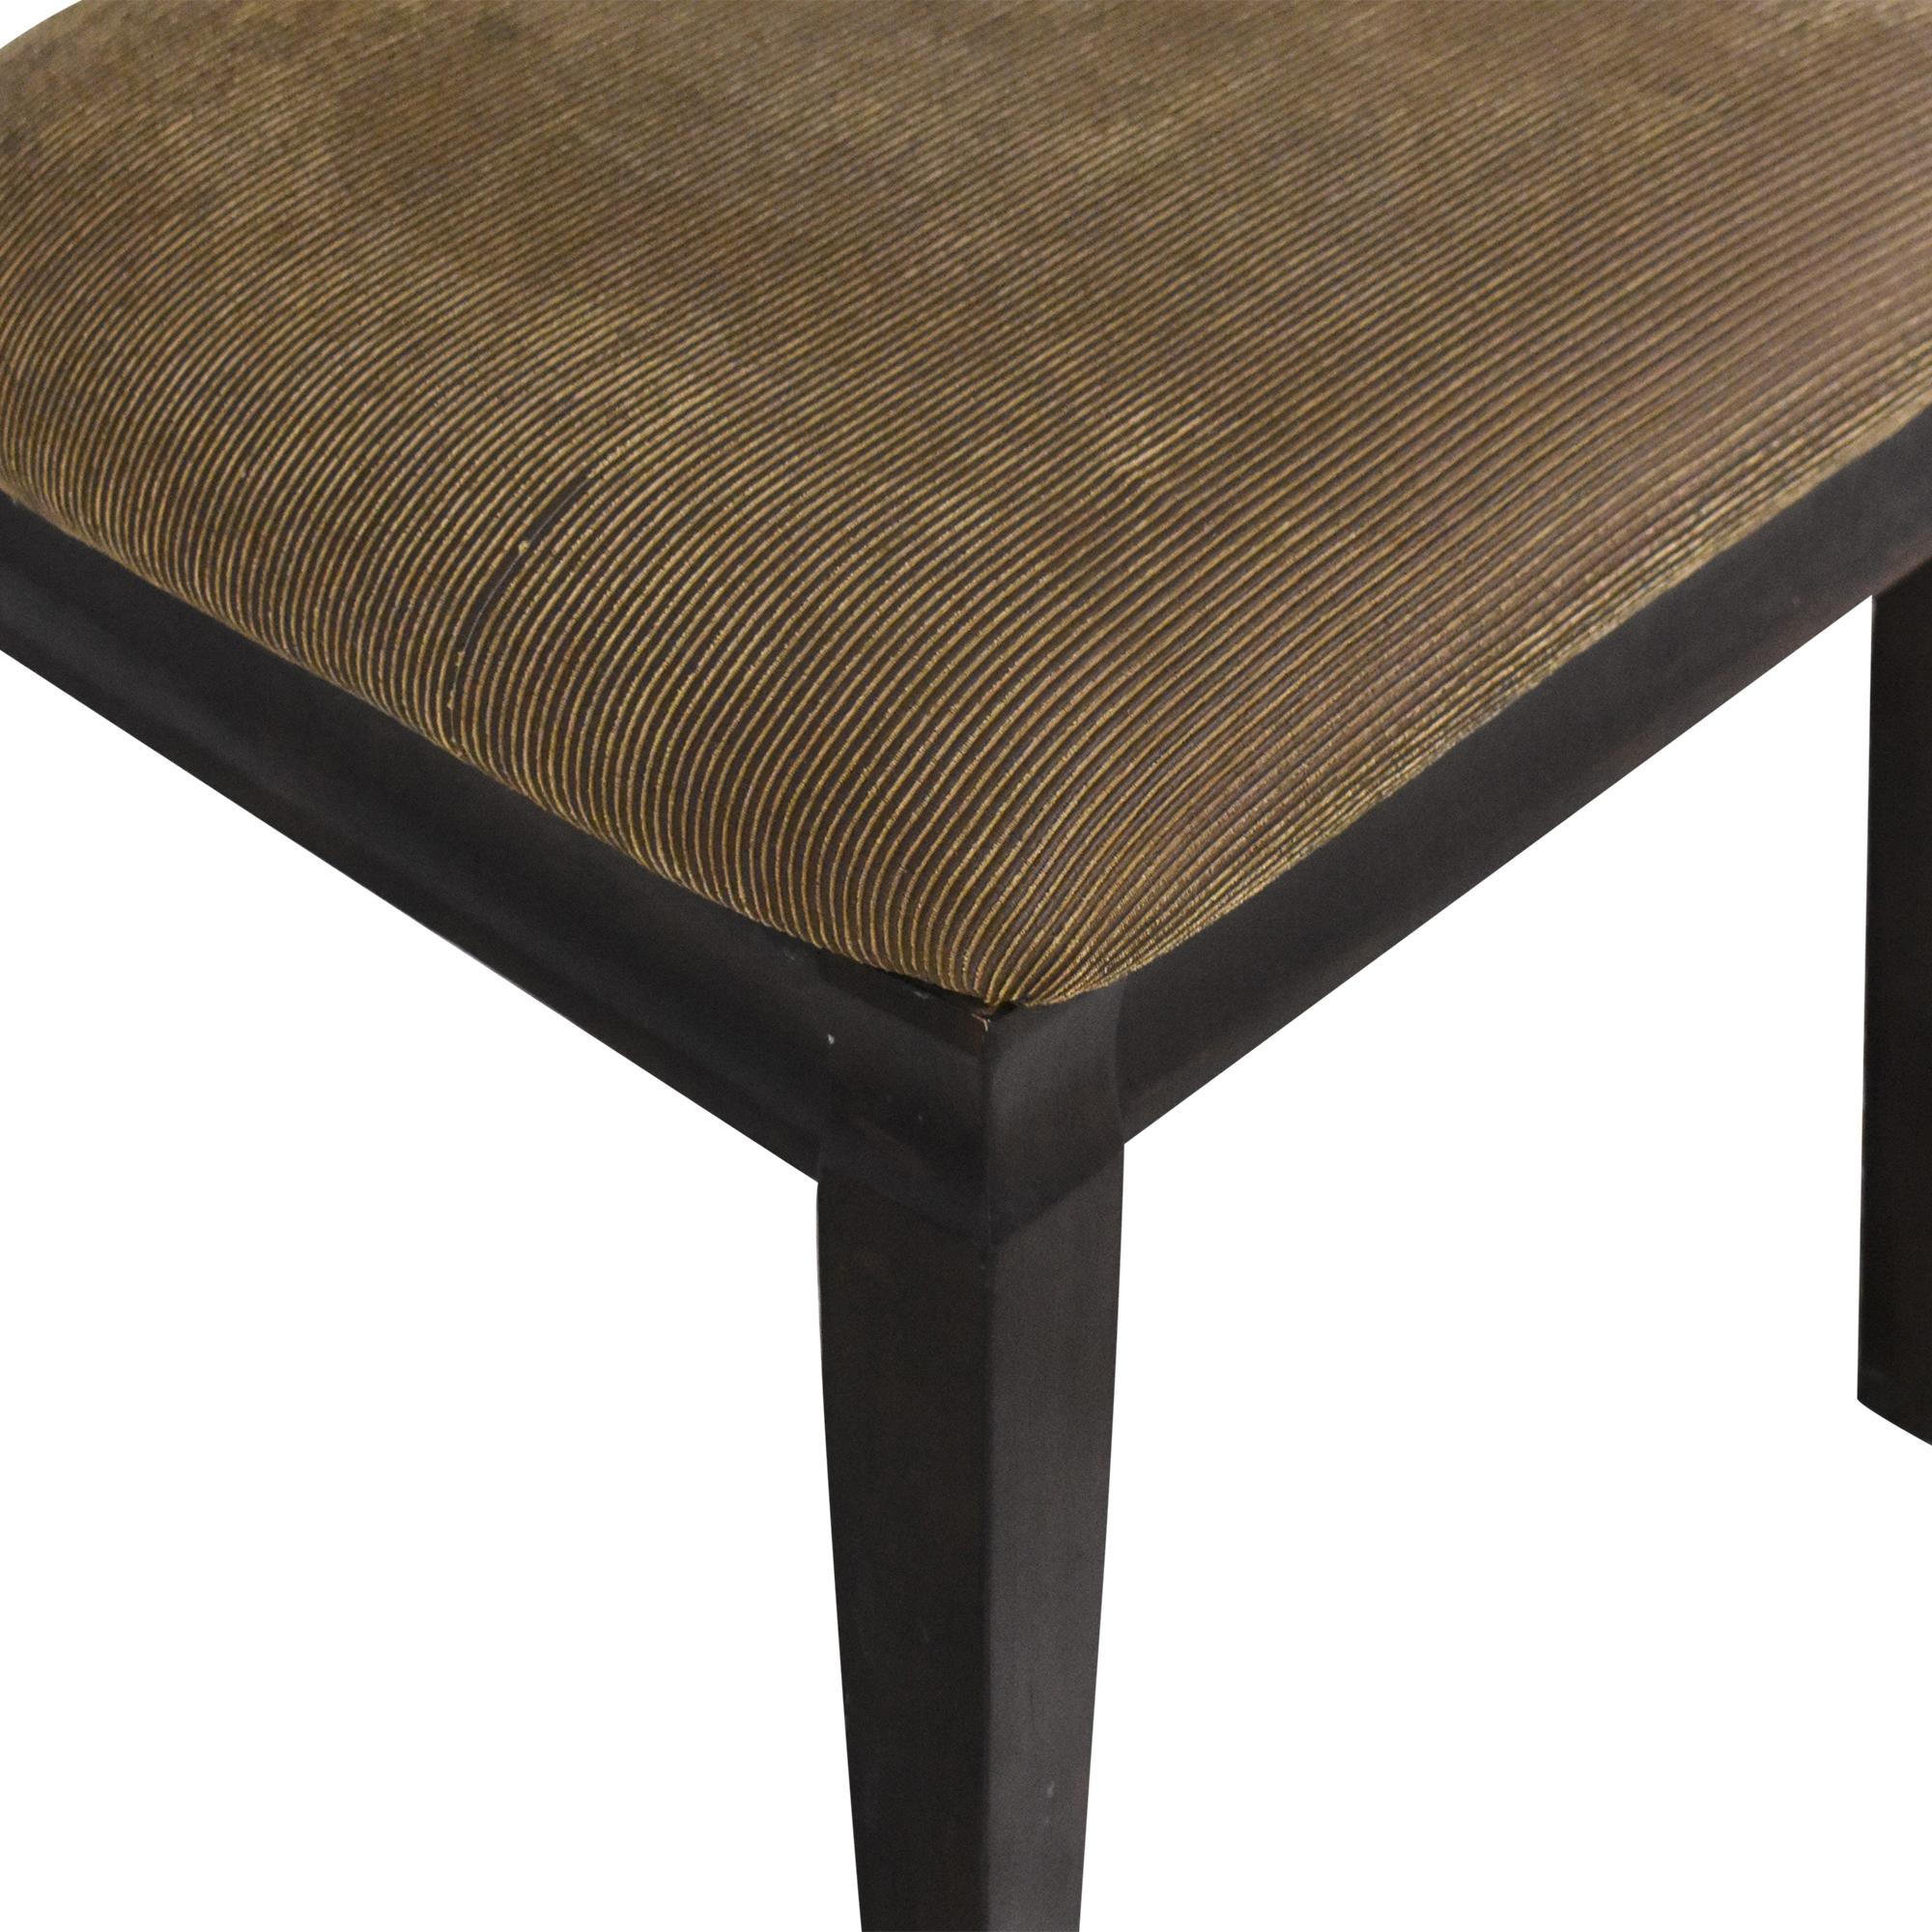 Ashley Furniture Ashley Furniture Hayley Dining Chairs